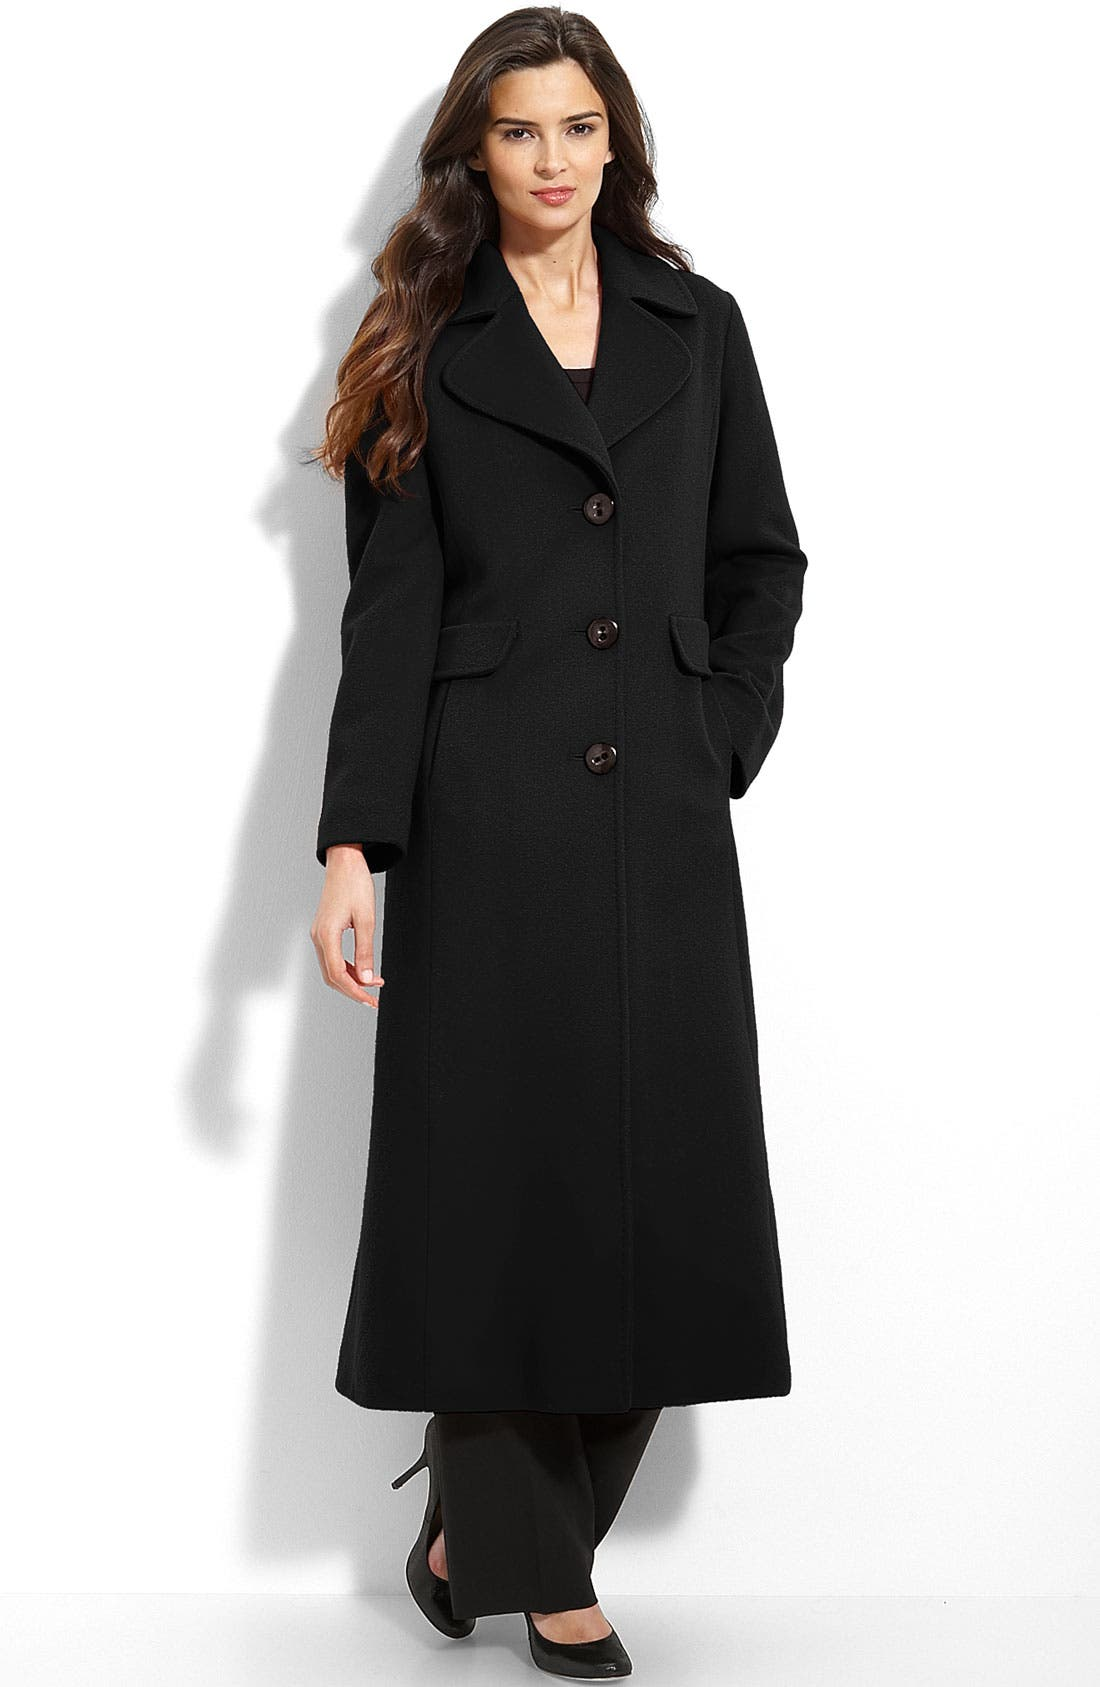 FLEURETTE,                             Loro Piana Wool Coat,                             Main thumbnail 1, color,                             001